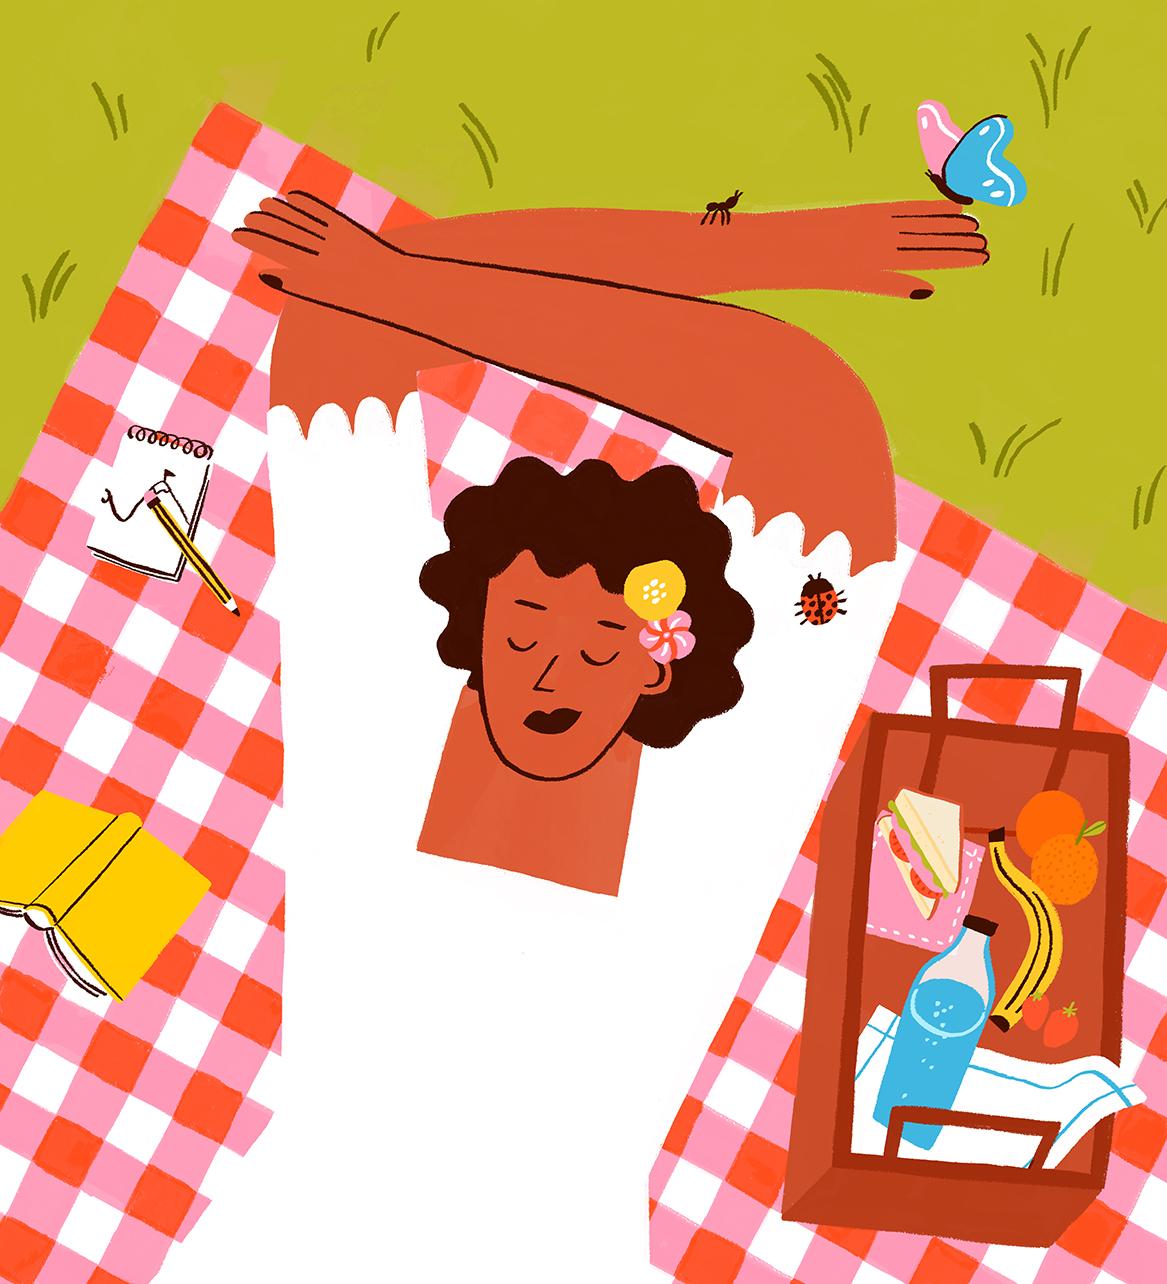 picnic-woman-gentle-dress-pride-book-illustration-violeta-noy-thumbnail